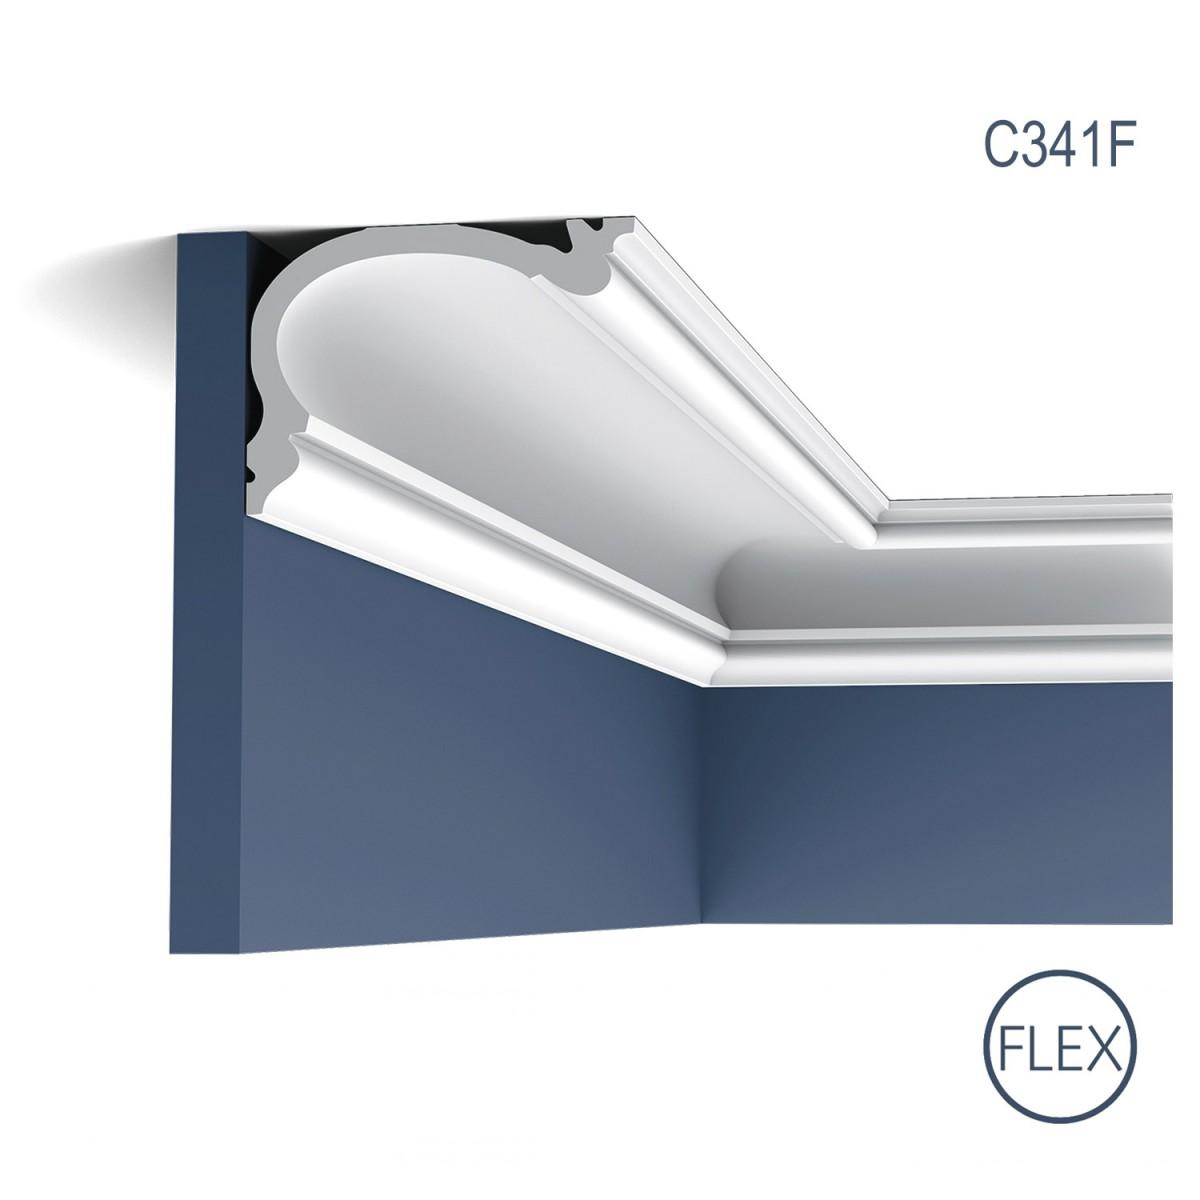 Cornisa Flex Luxxus C341F, Dimensiuni: 200 X 12.2 X 8.8 cm, Orac Decor